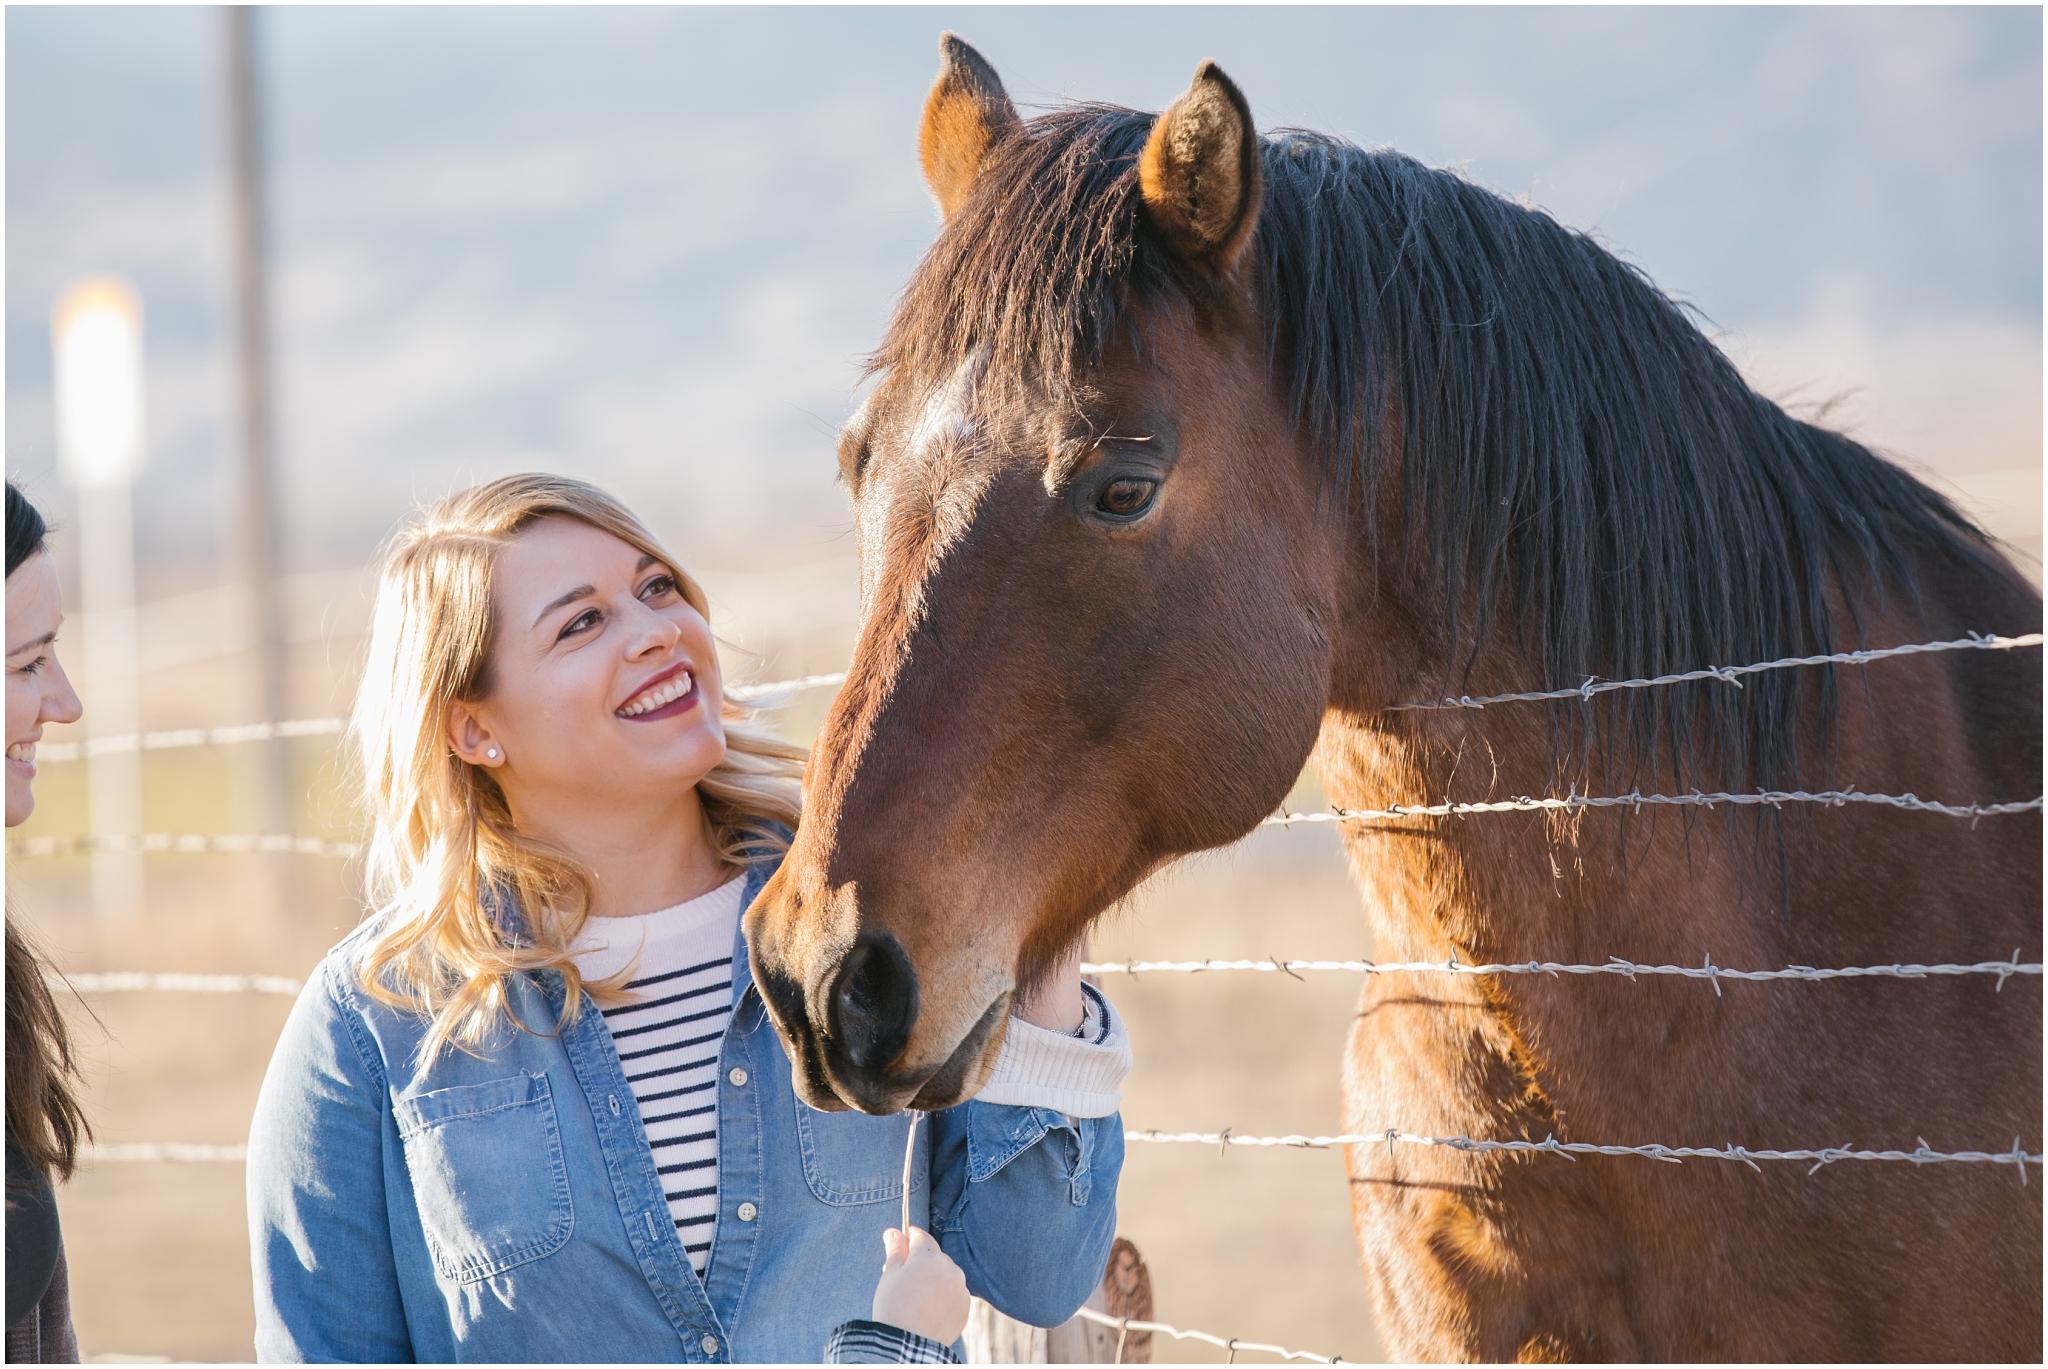 Conrad-70_Lizzie-B-Imagery-Utah-Family-Photographer-Utah-County-Central-Utah-Park-City-Extended-Family-Session.jpg